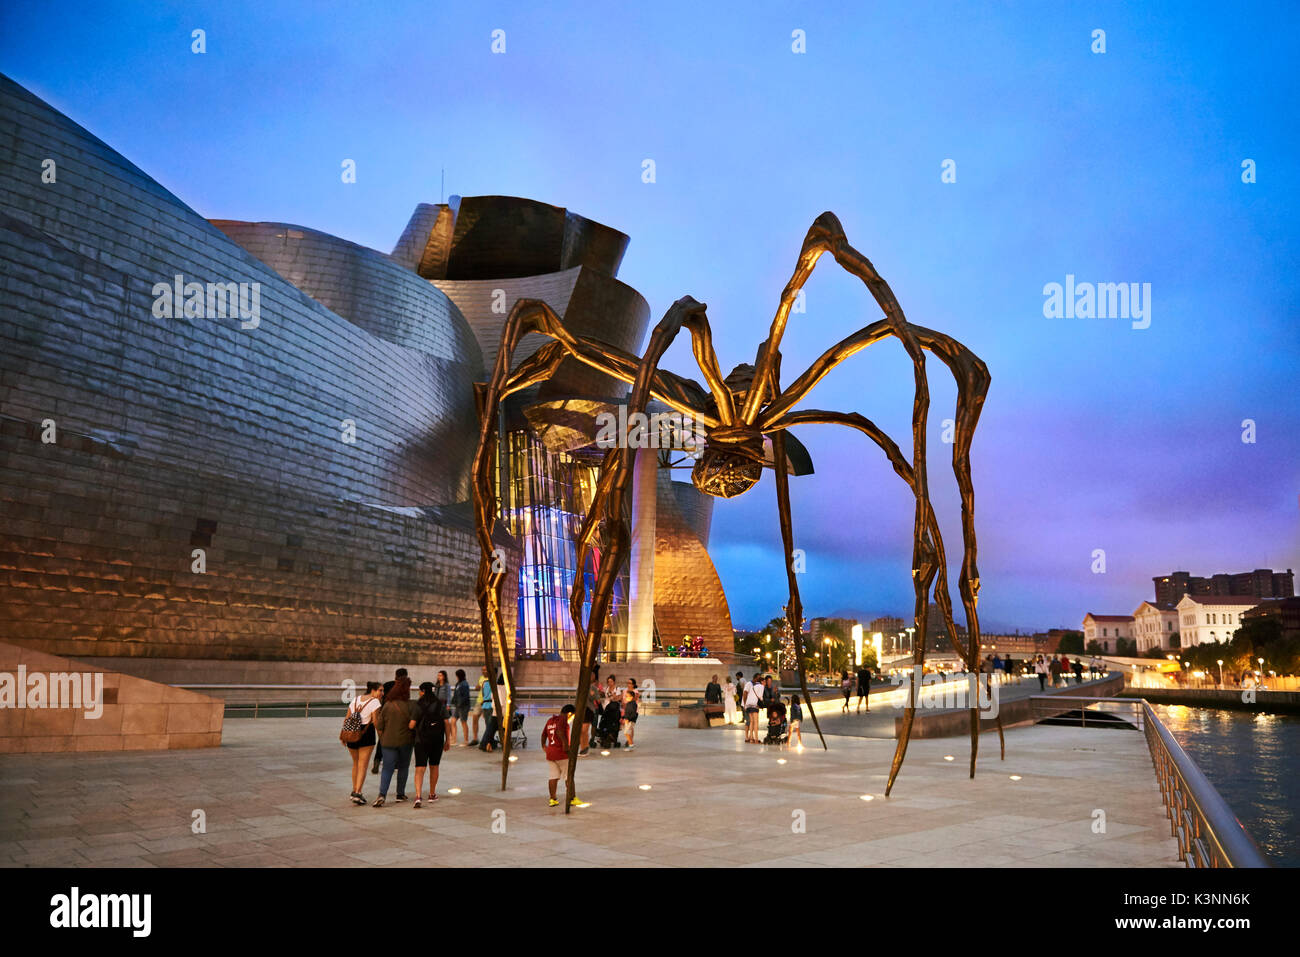 Guggenheim Museum, Bilbao, Vizcaya, Baskenland, Spanien, Europa Stockbild